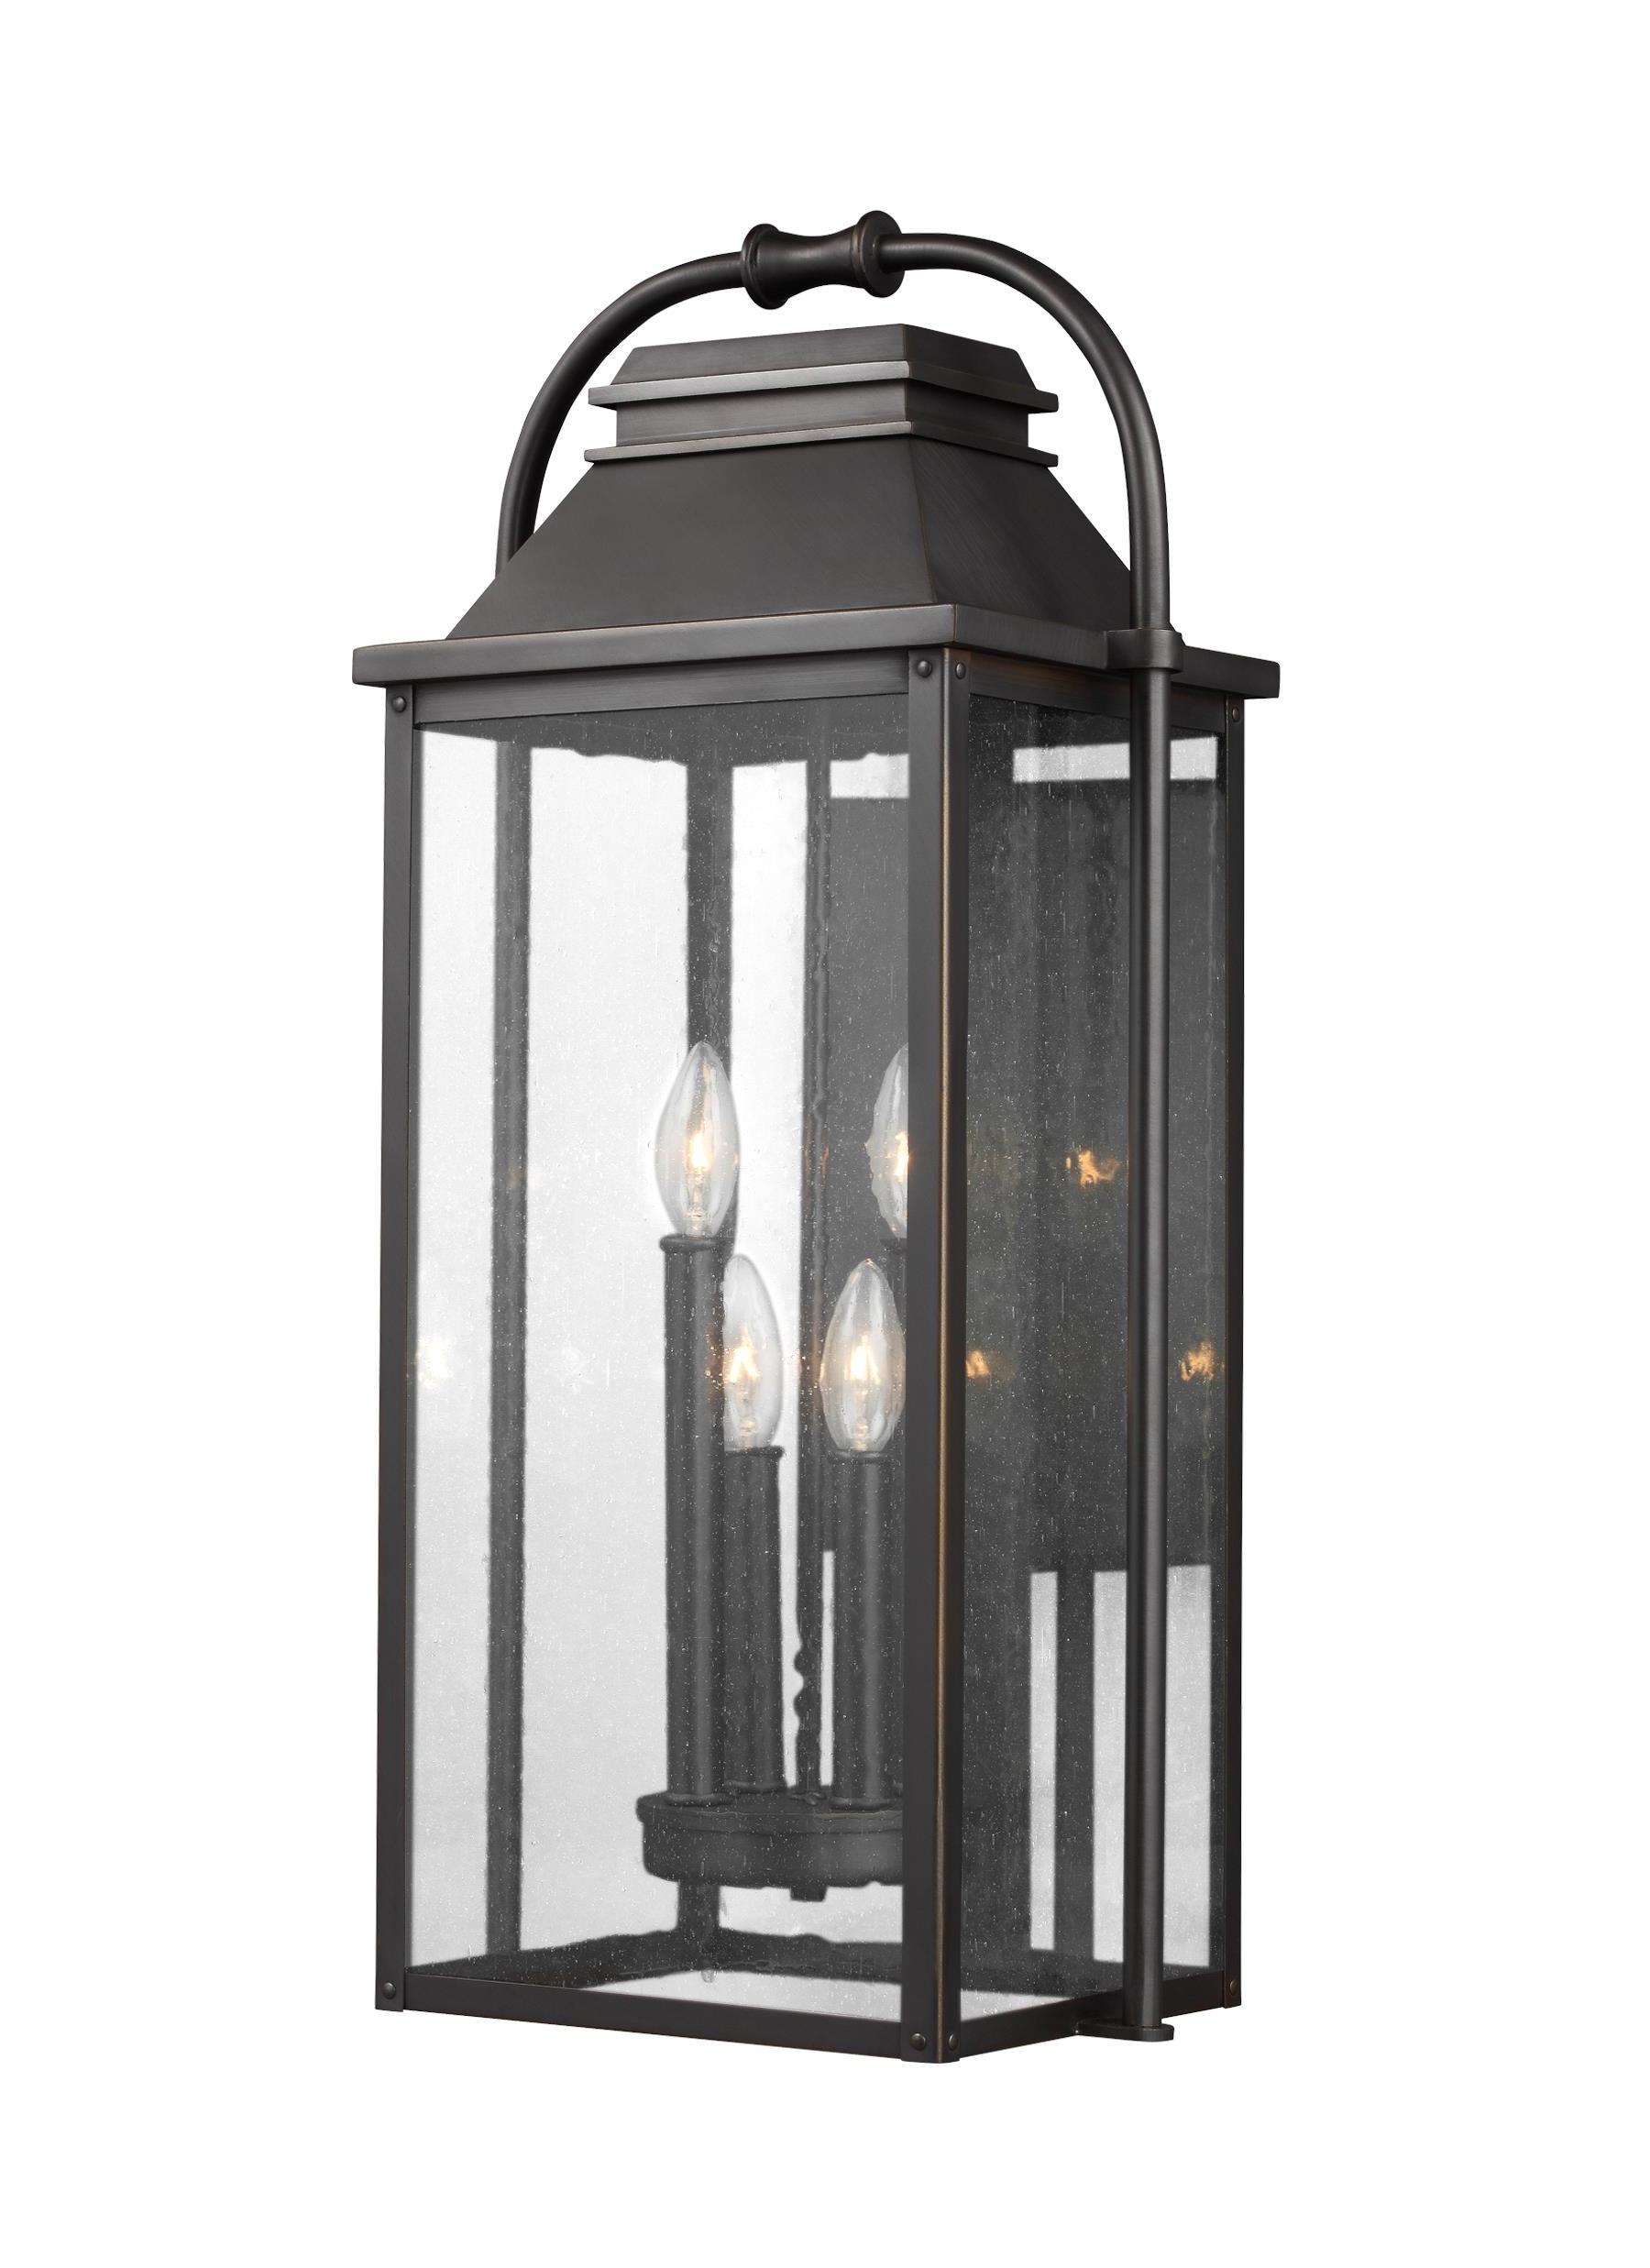 Most Recent Antique Outdoor Lanterns Inside Ol13202anbz,4 – Light Outdoor Wall Lantern,antique Bronze (View 17 of 20)